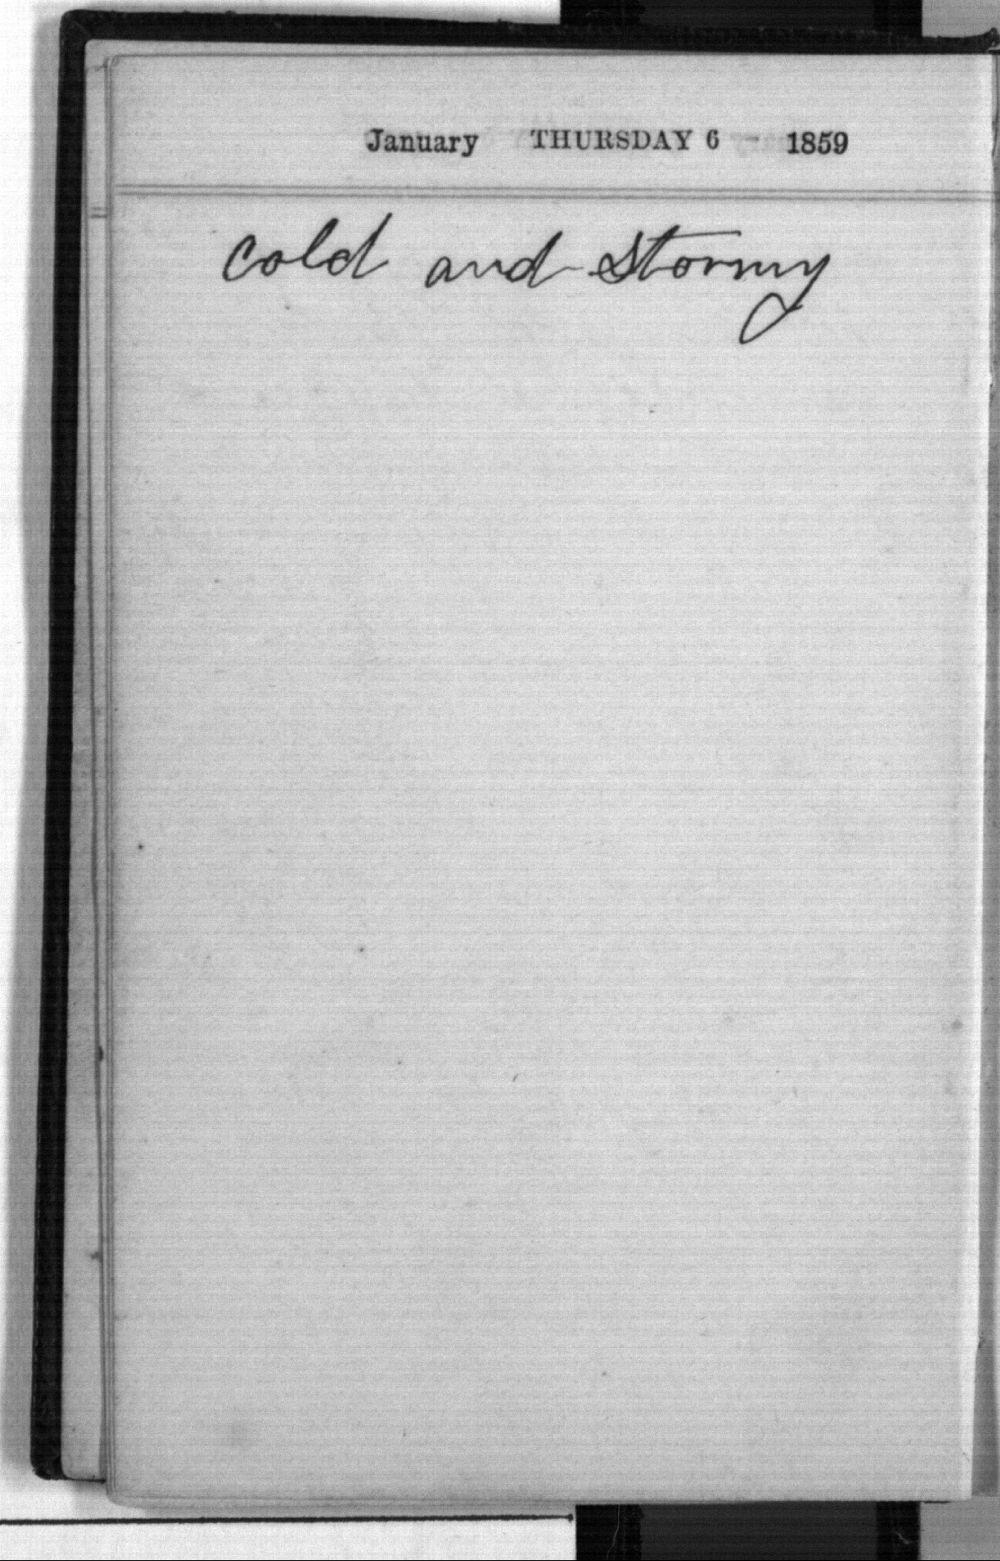 Daniel Mulford Valentine's diary - Jan 6